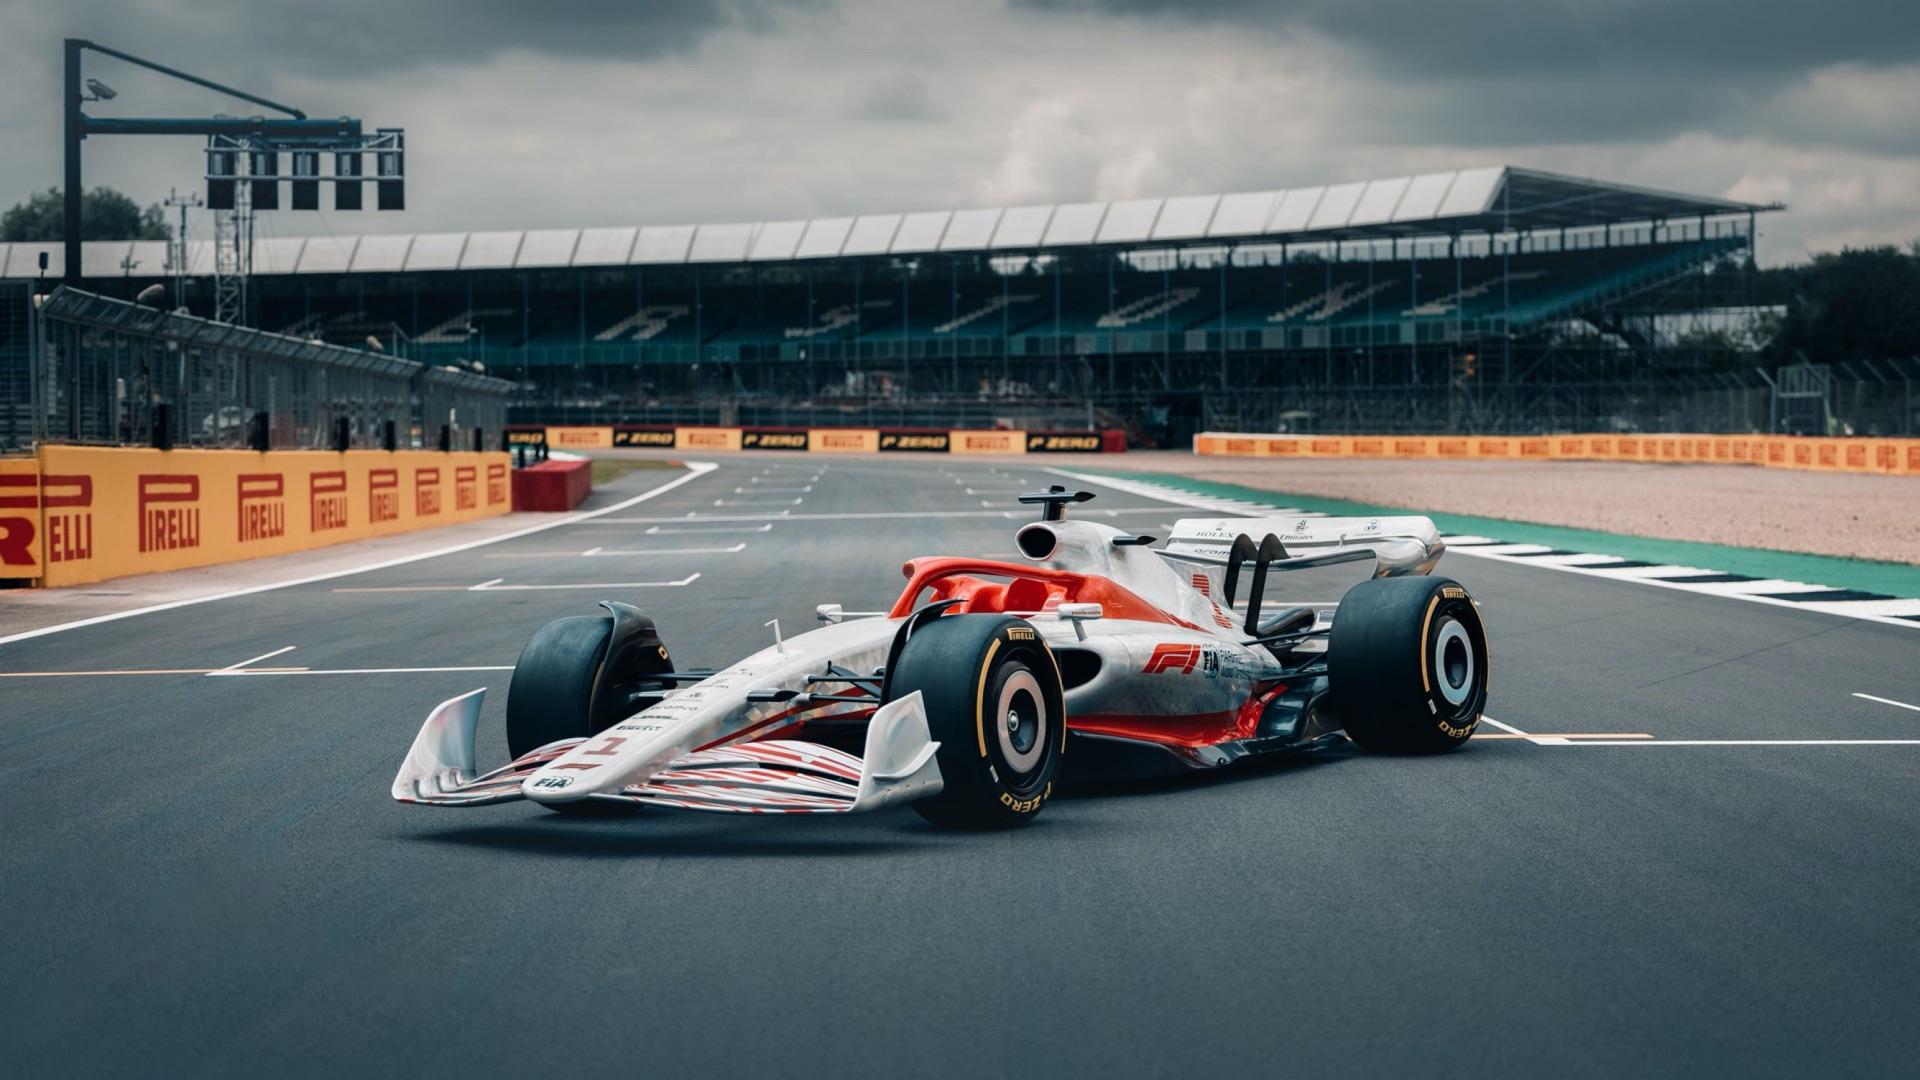 1_F1-Formula-1-car-2022-1_1920x1080